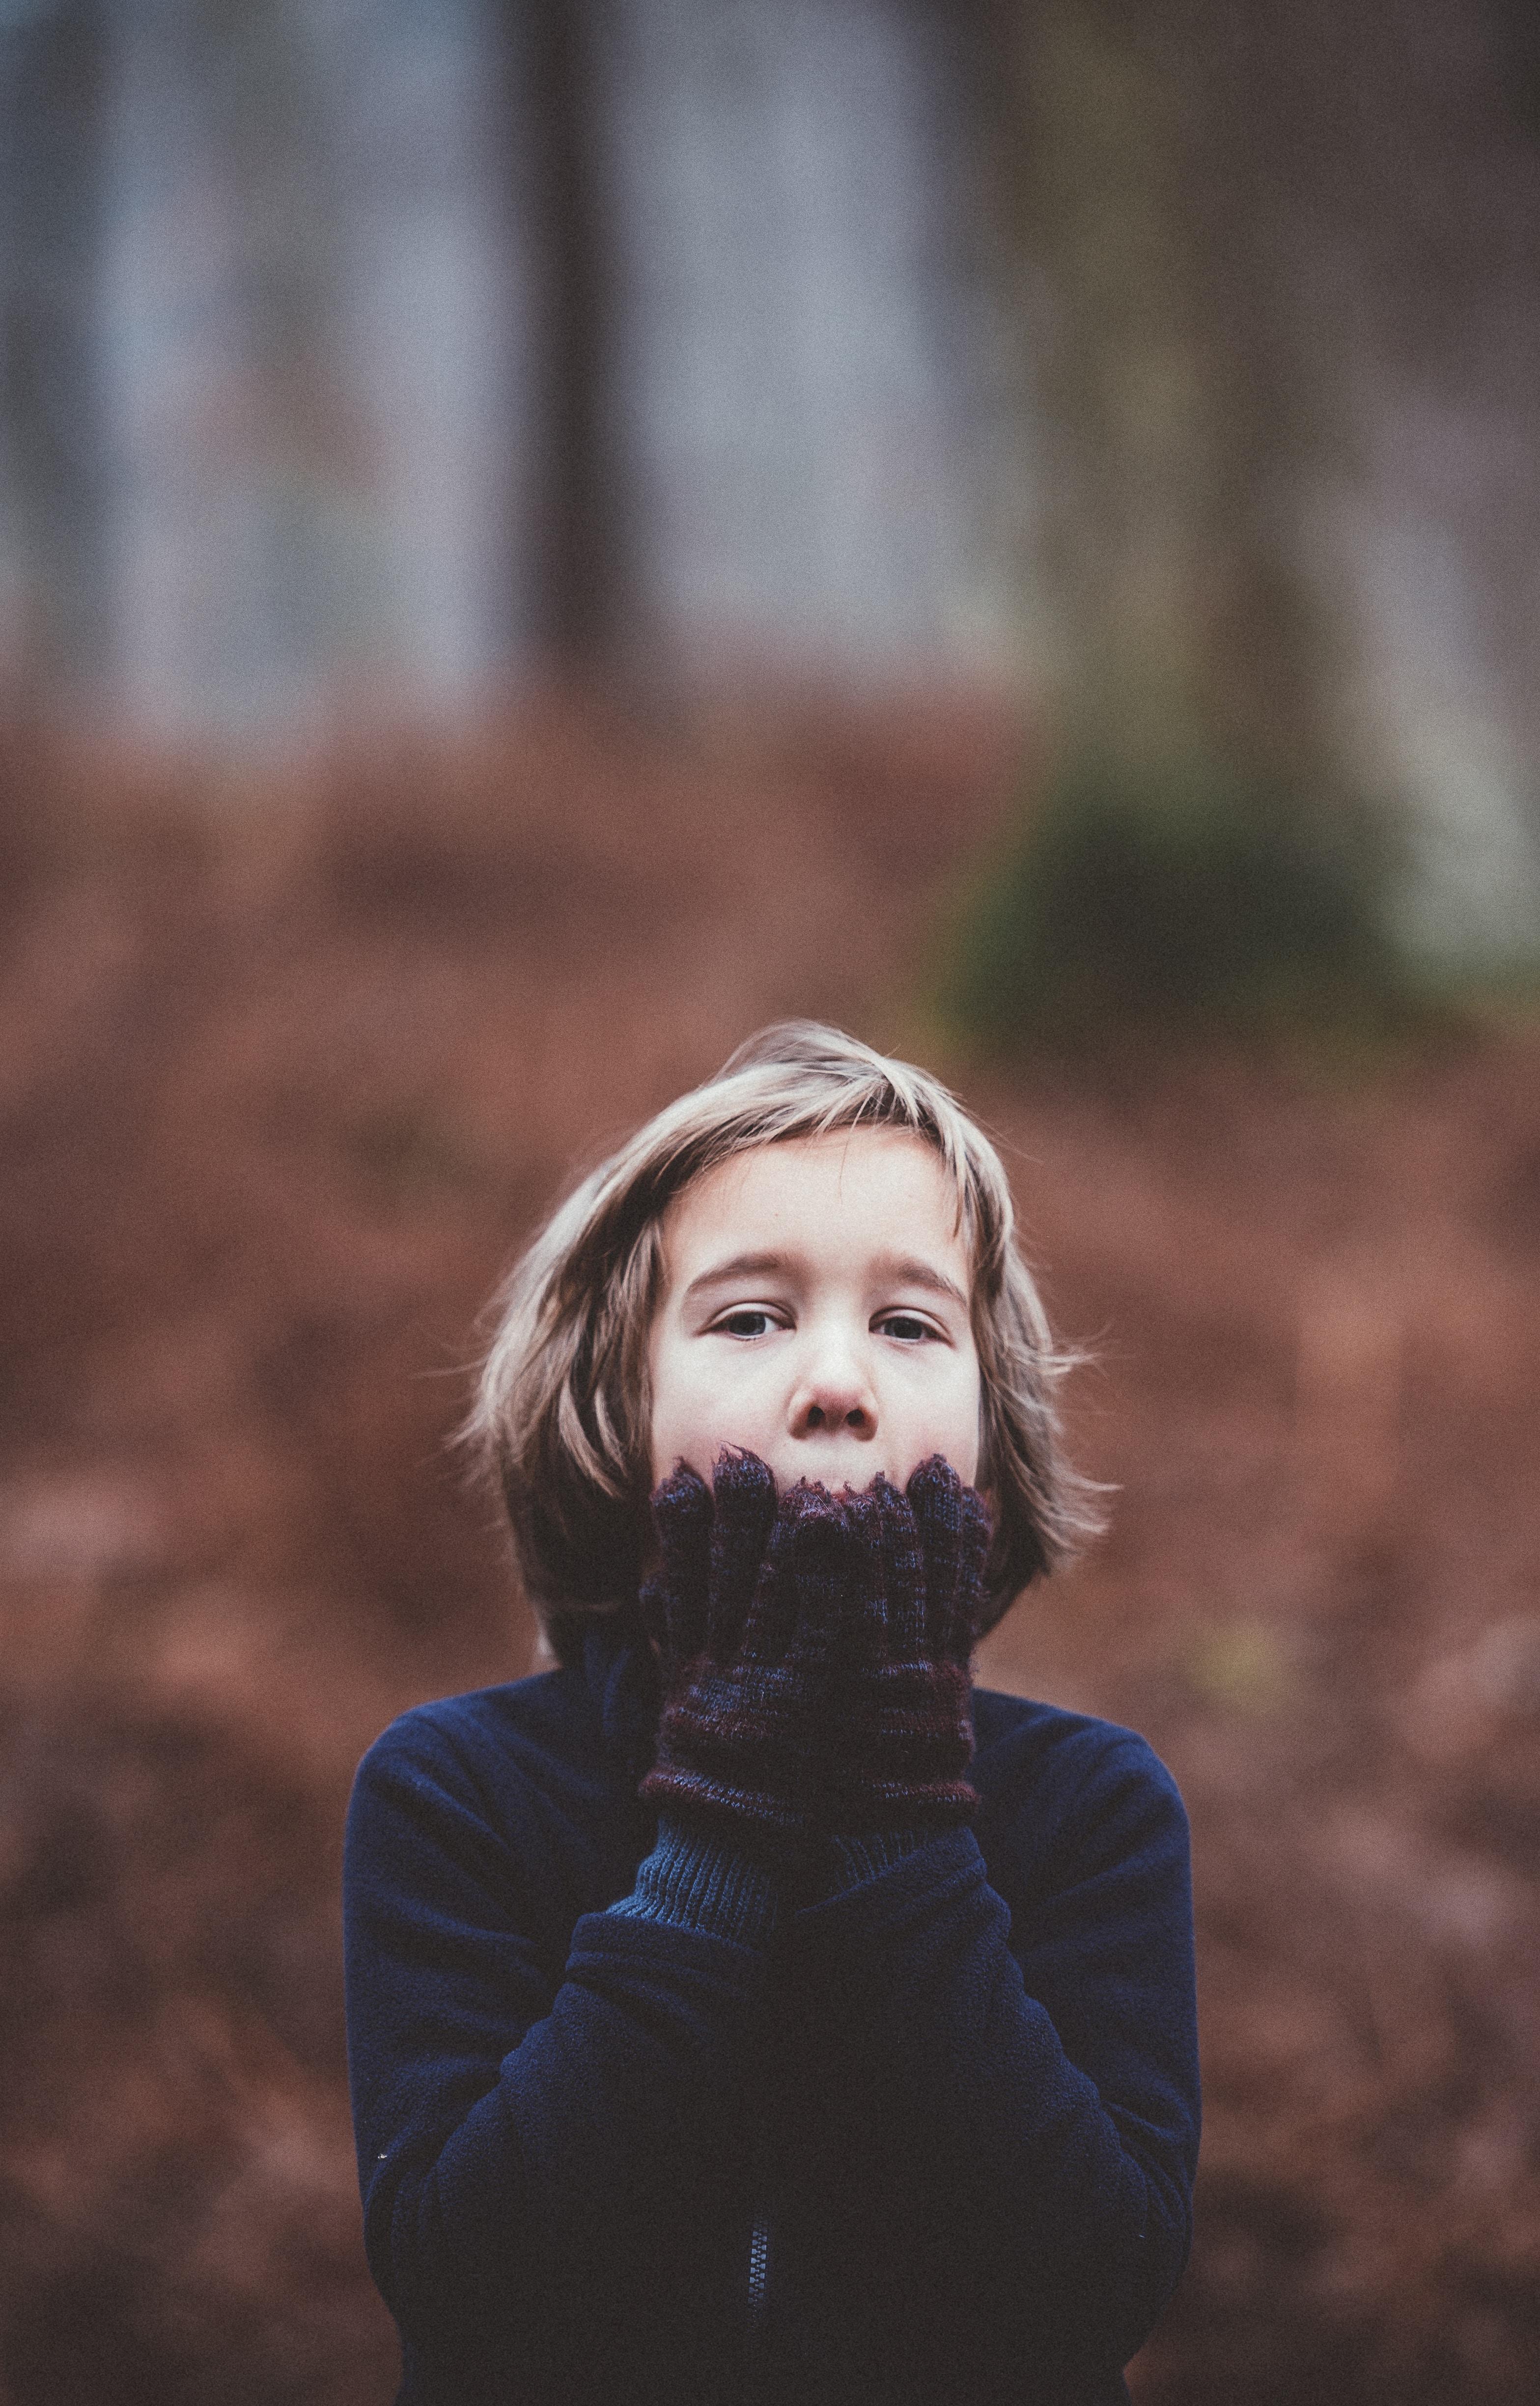 child holding chin